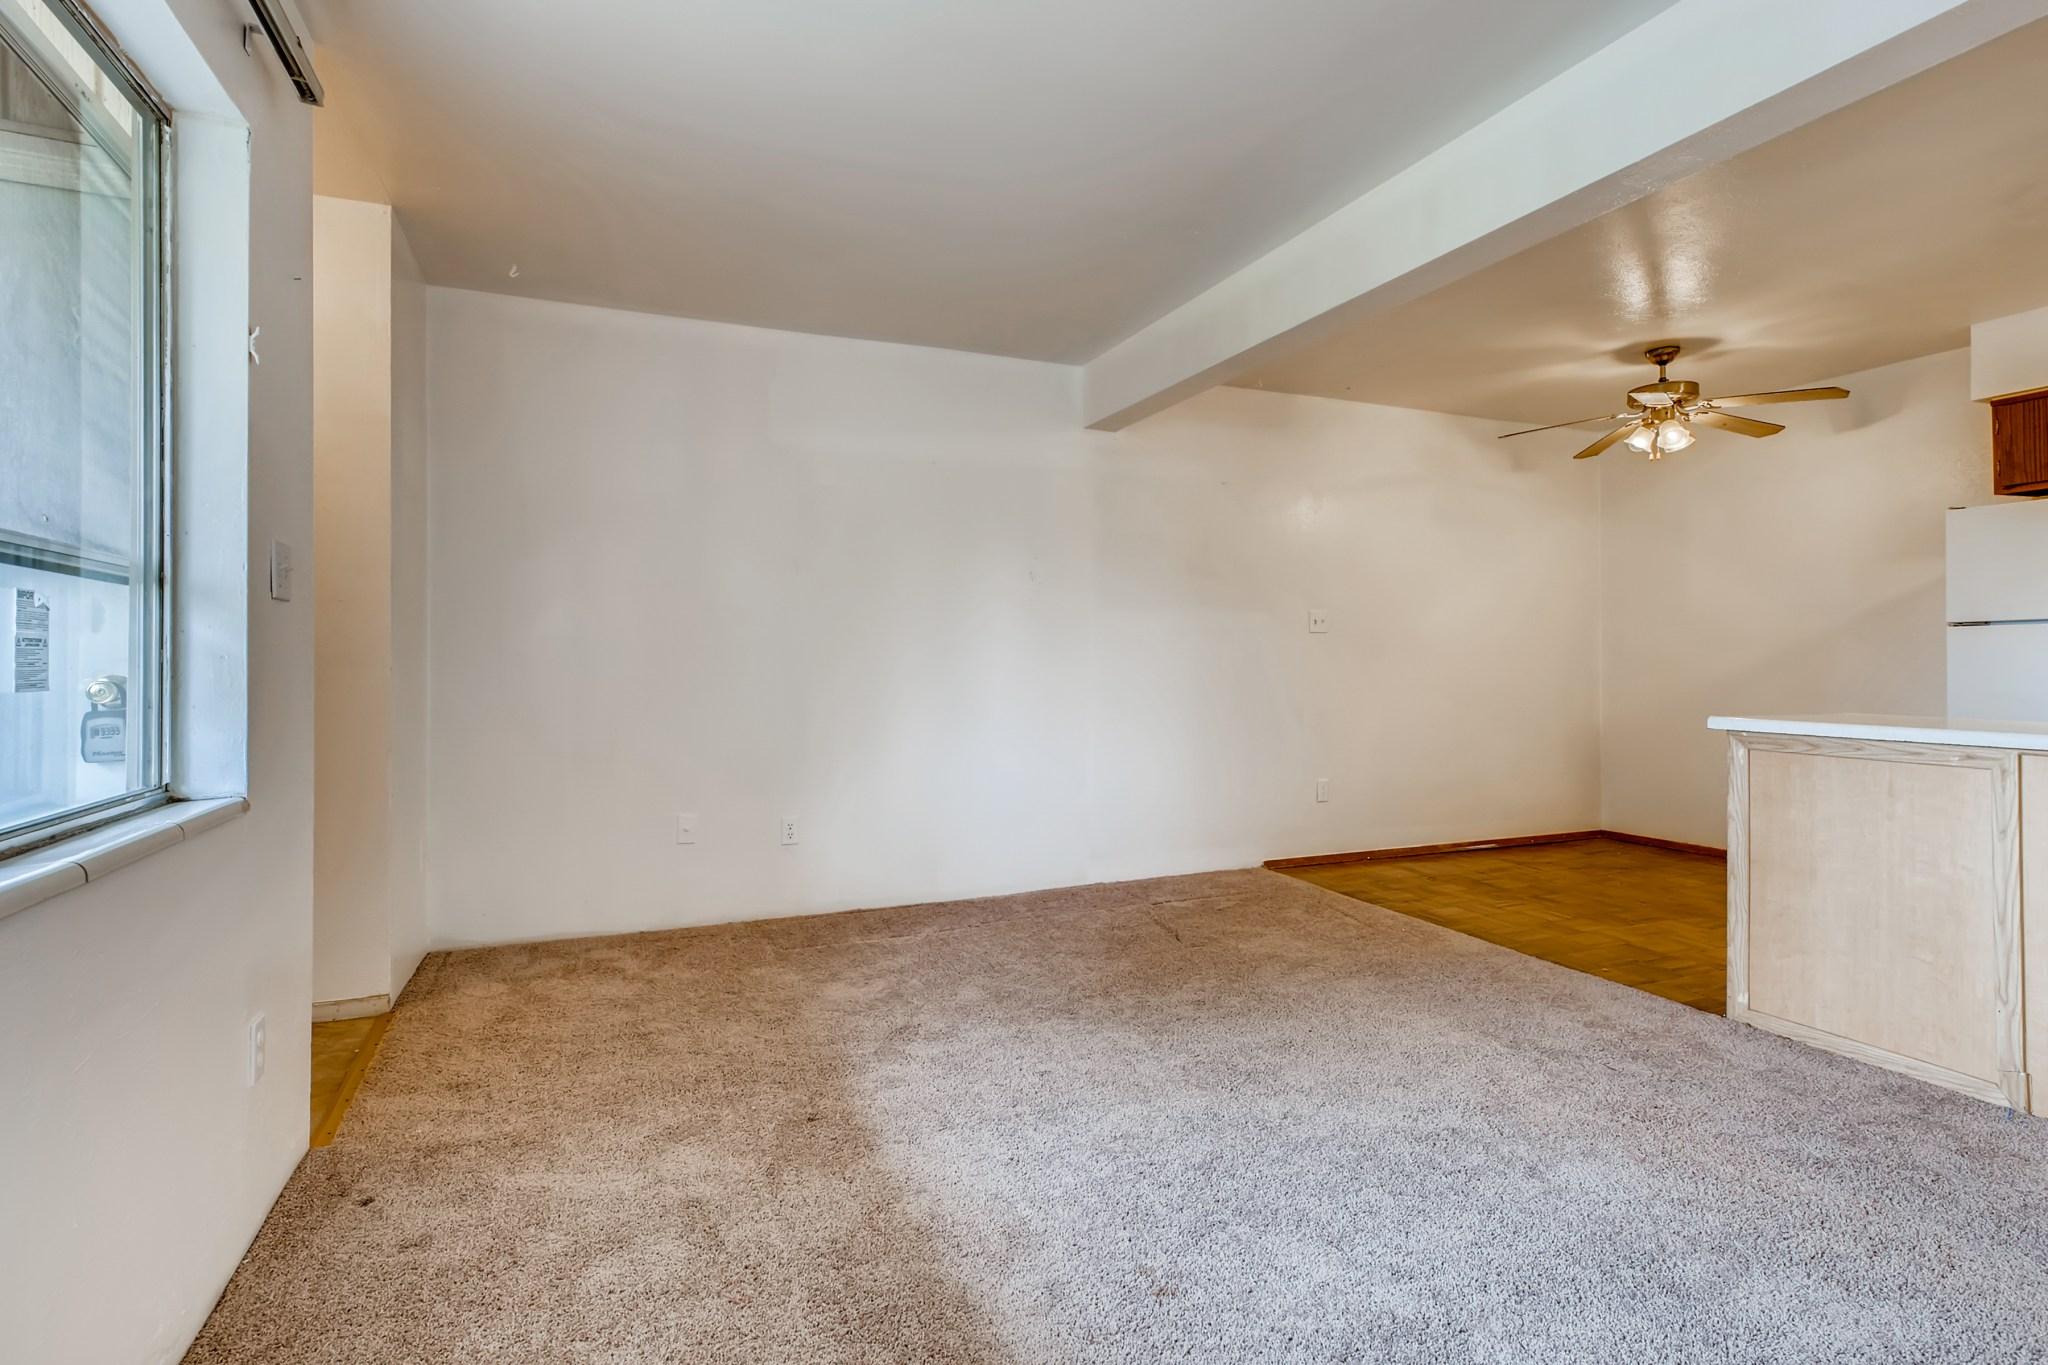 09-Living-Room